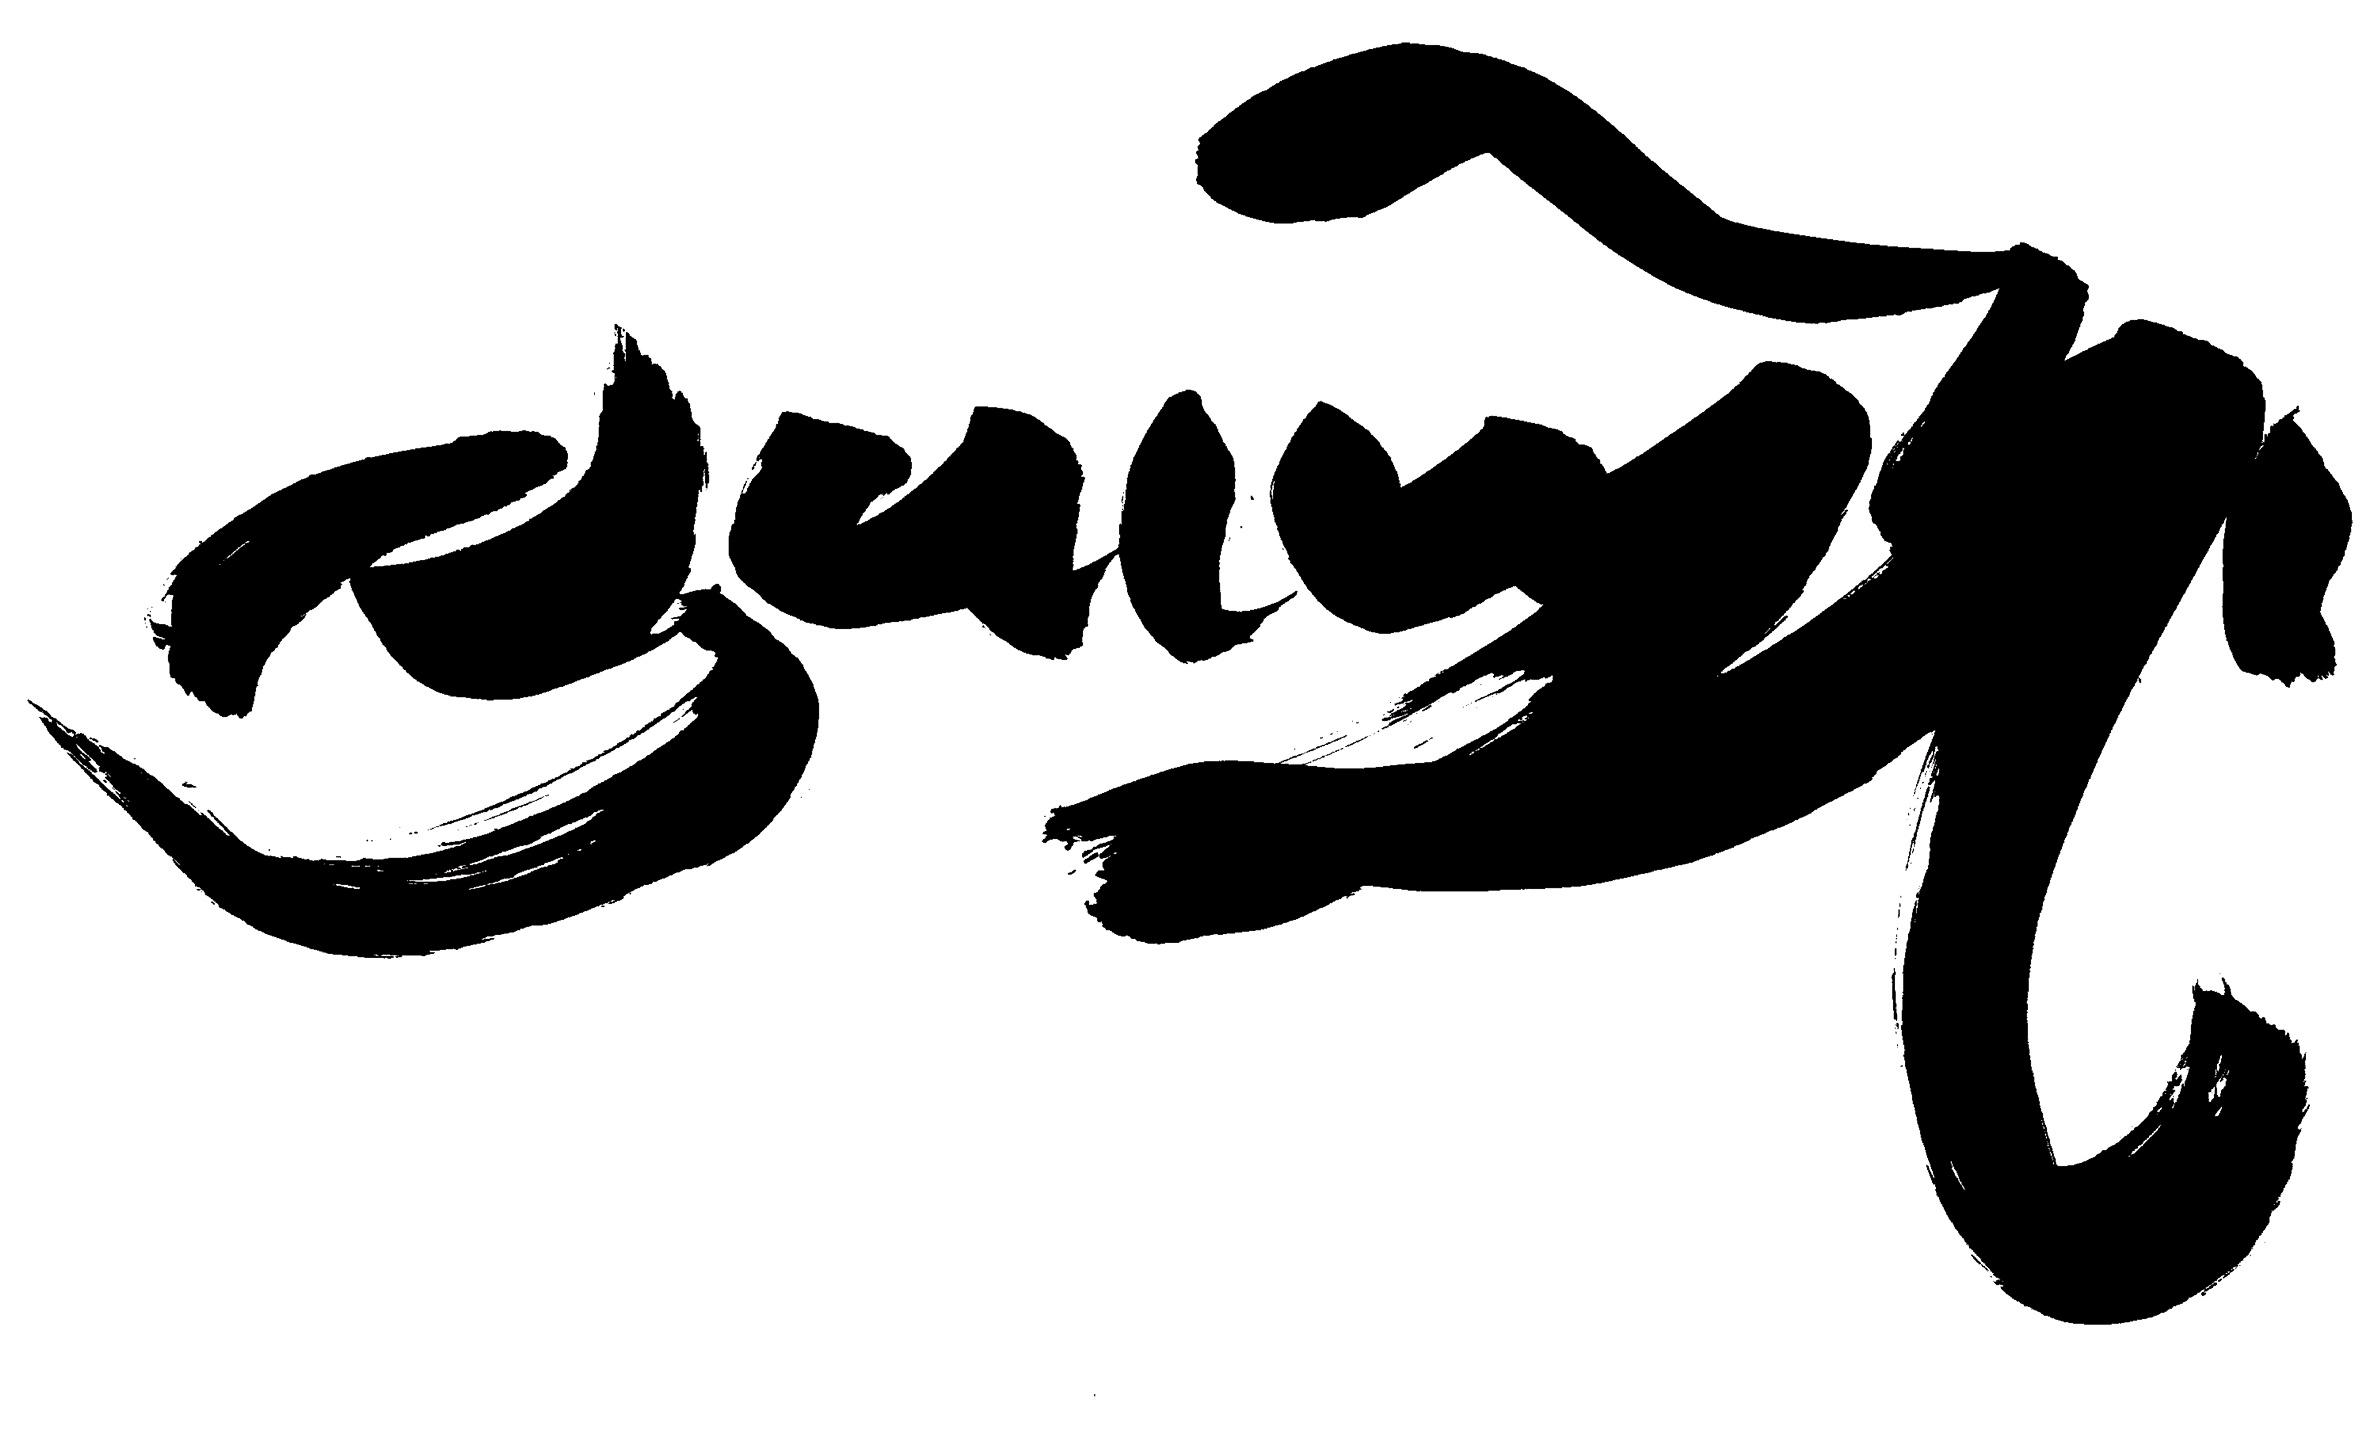 5 - Formation de professeurs de Lu Jong